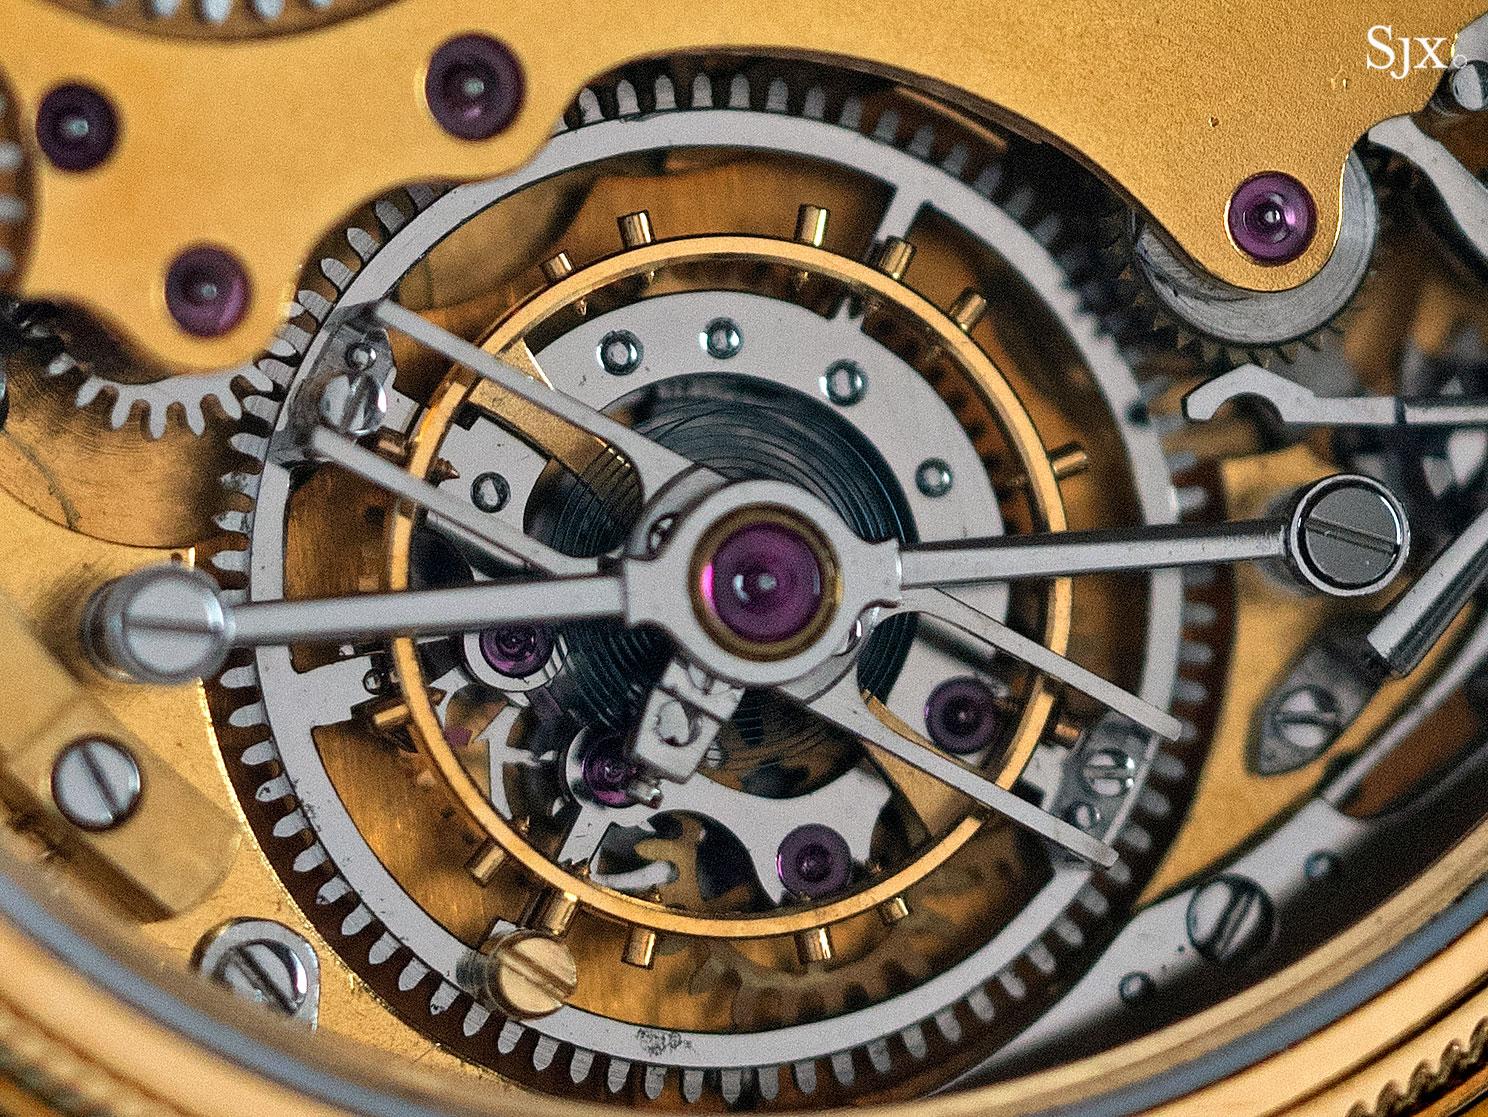 George Daniels Chronograph Wristwatch with tourbillon 19